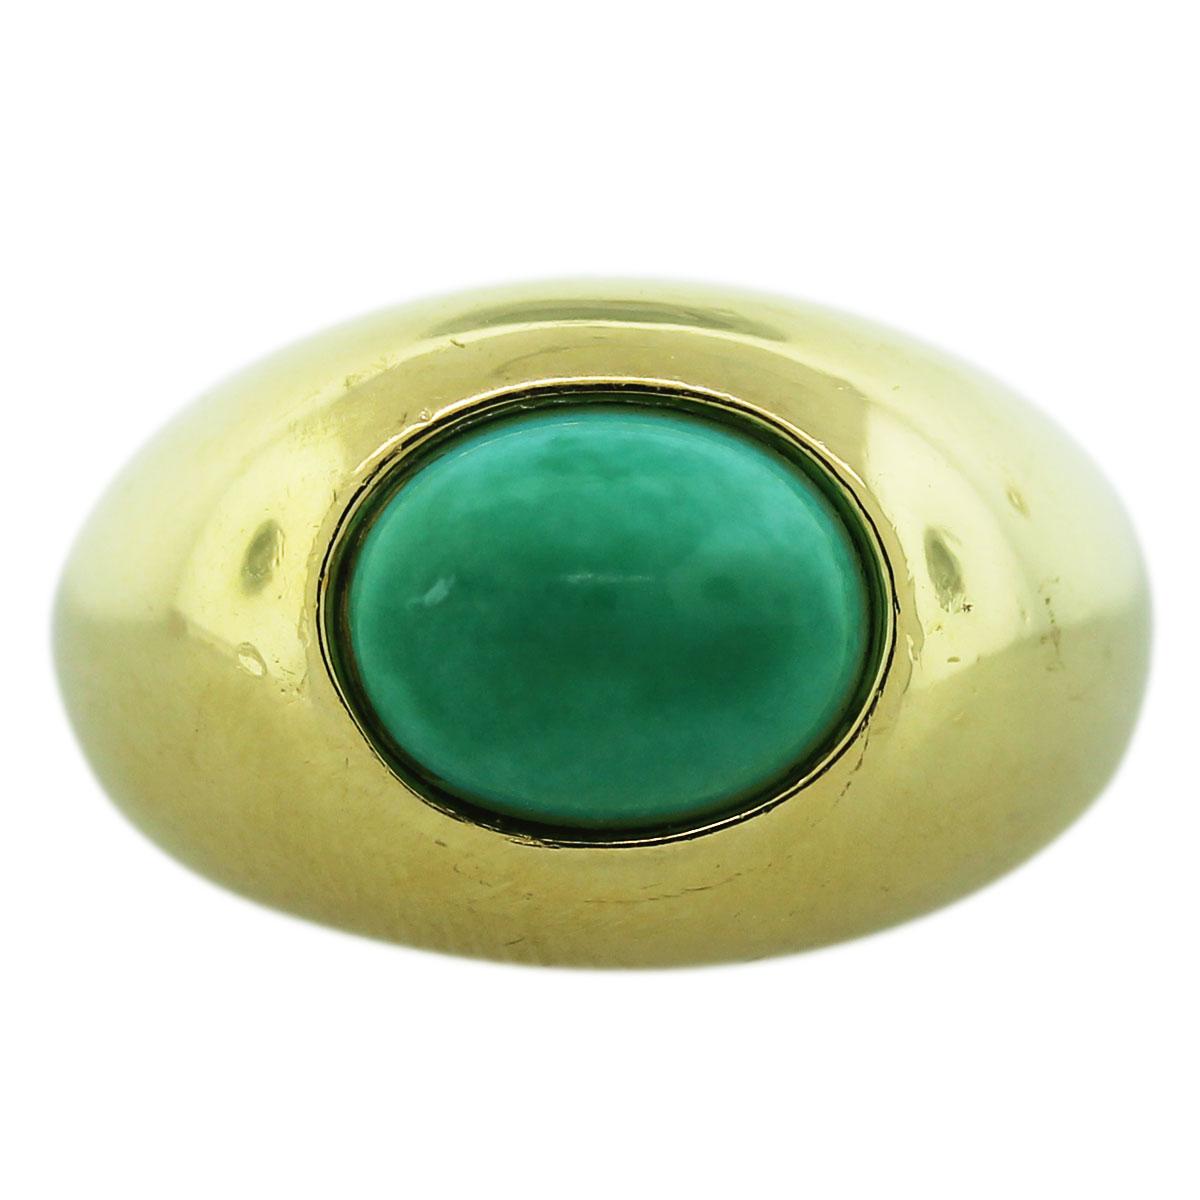 18K Yellow Gold Turquoise Cabochon Mens Ring Boca Raton